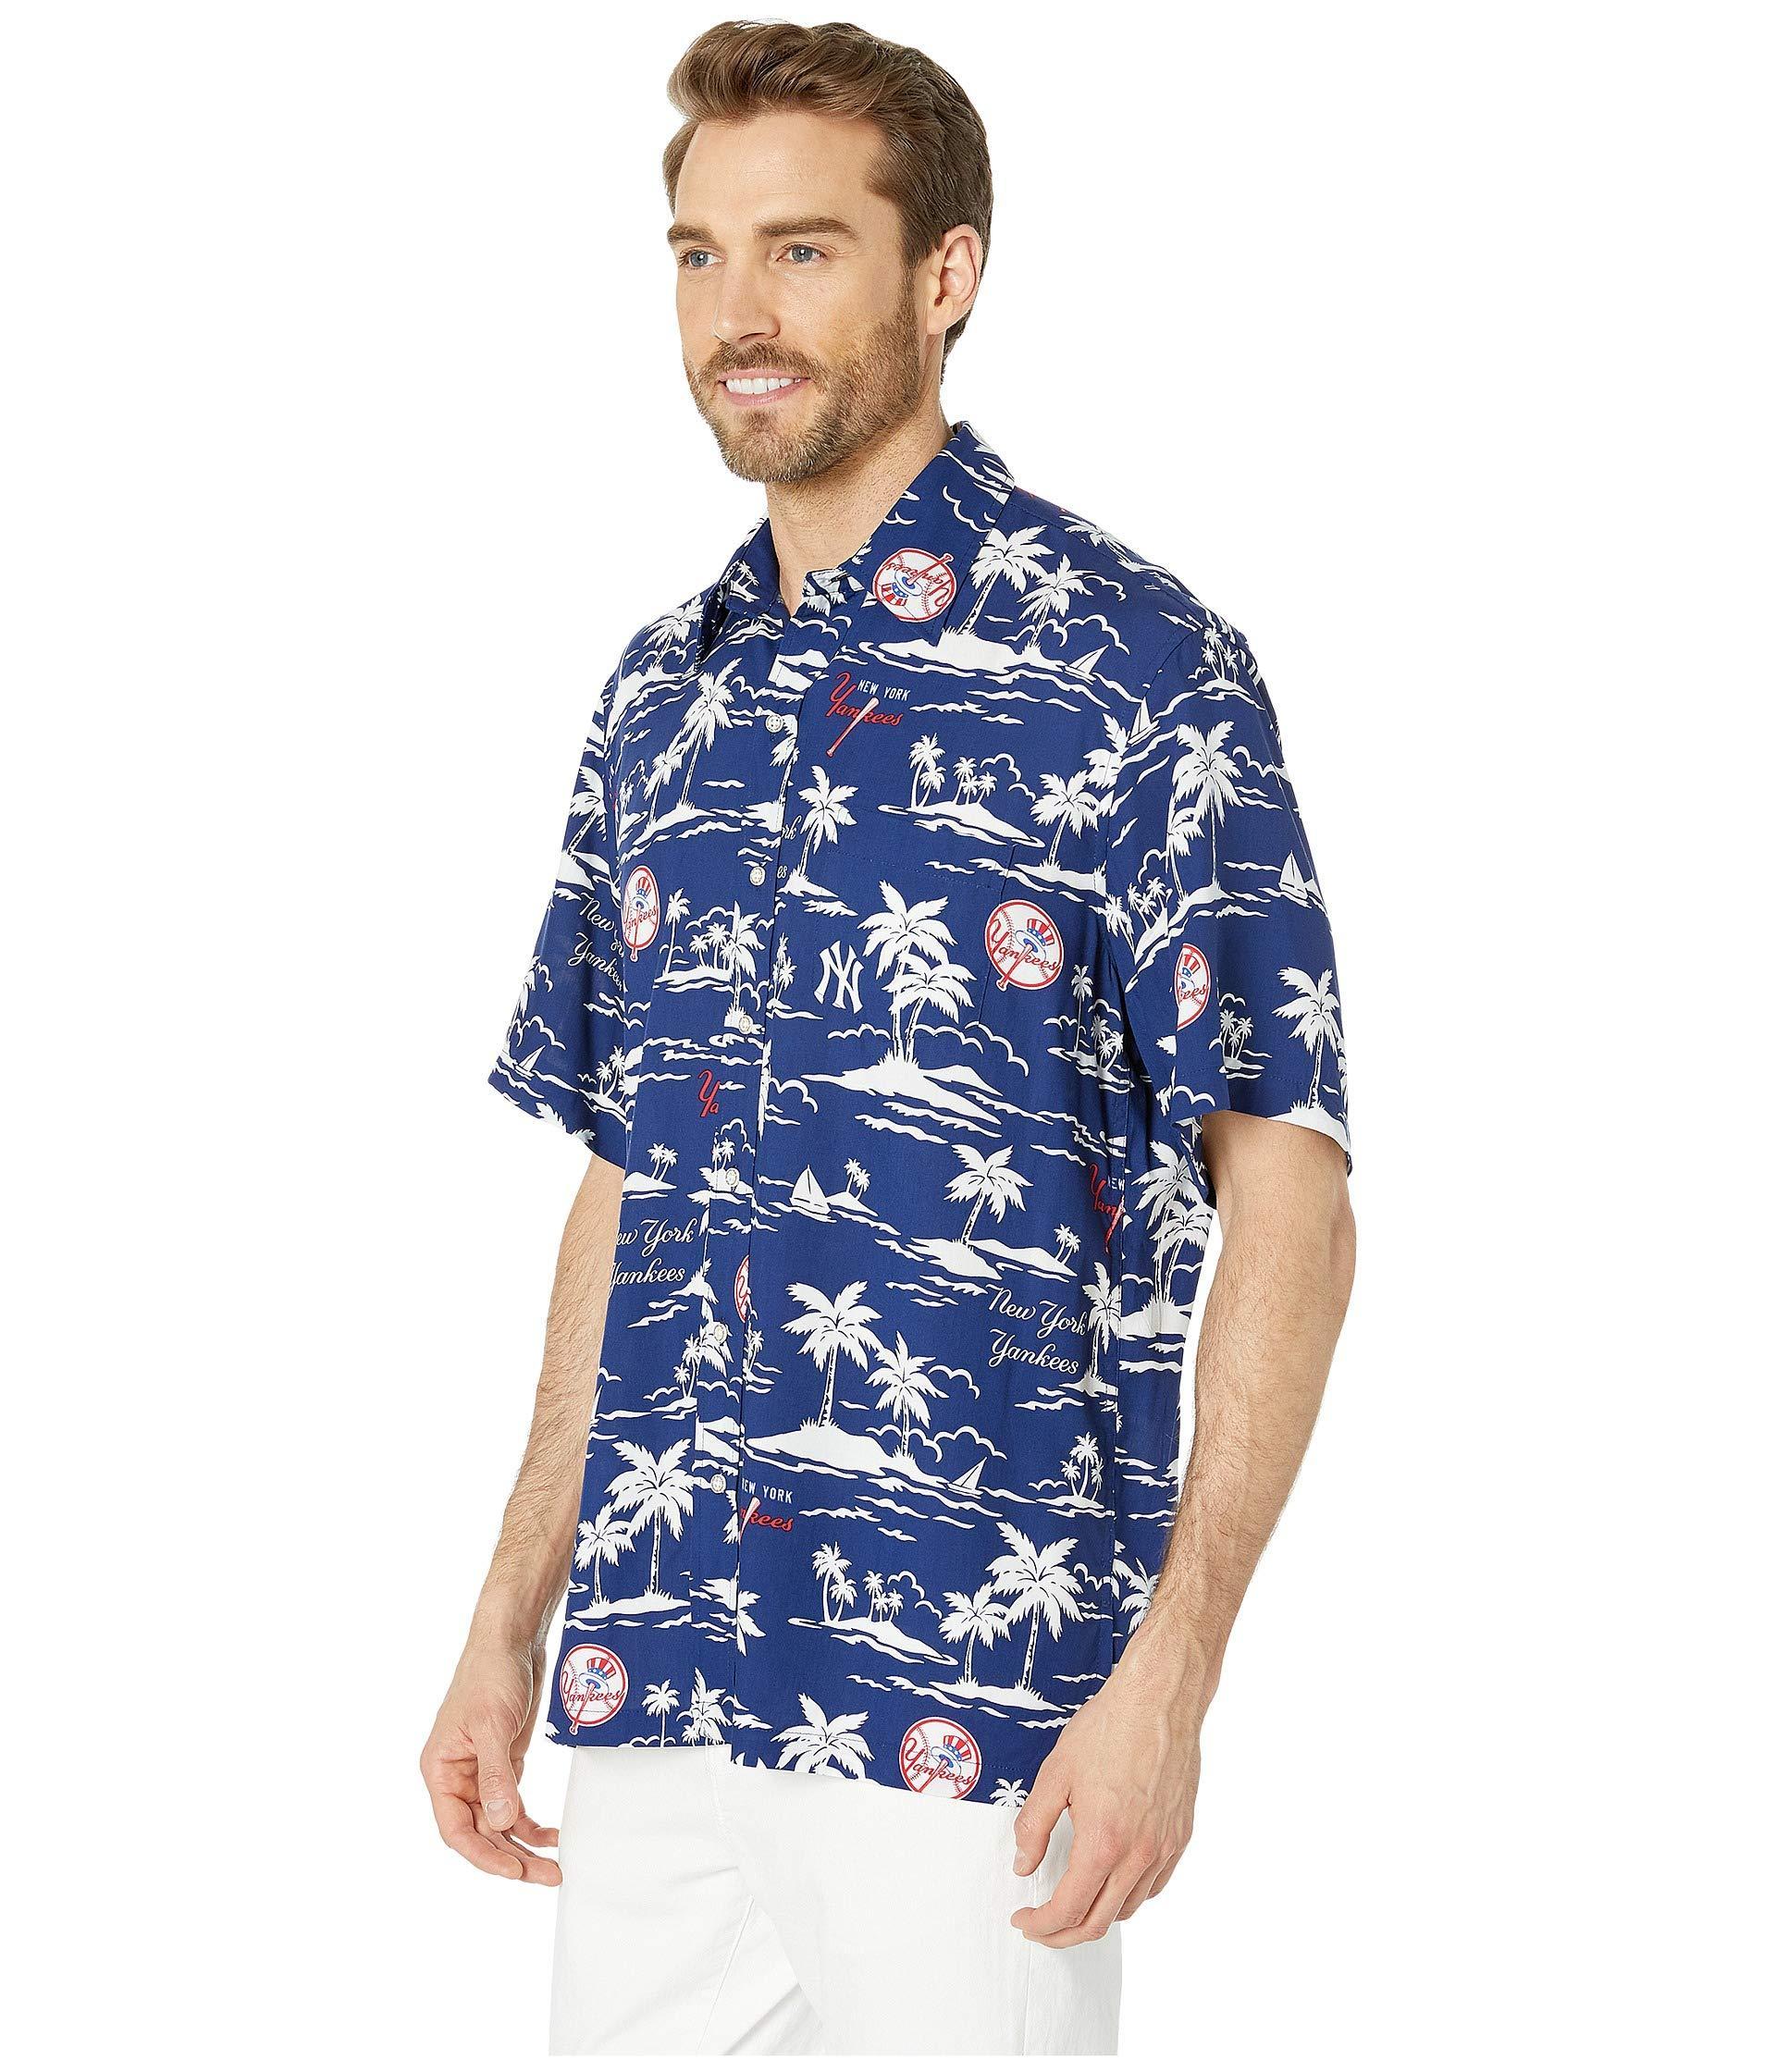 9c11cdb36 Lyst - Reyn Spooner New York Yankees Vintage Rayon Shirt (navy) Men's  Clothing in Blue for Men